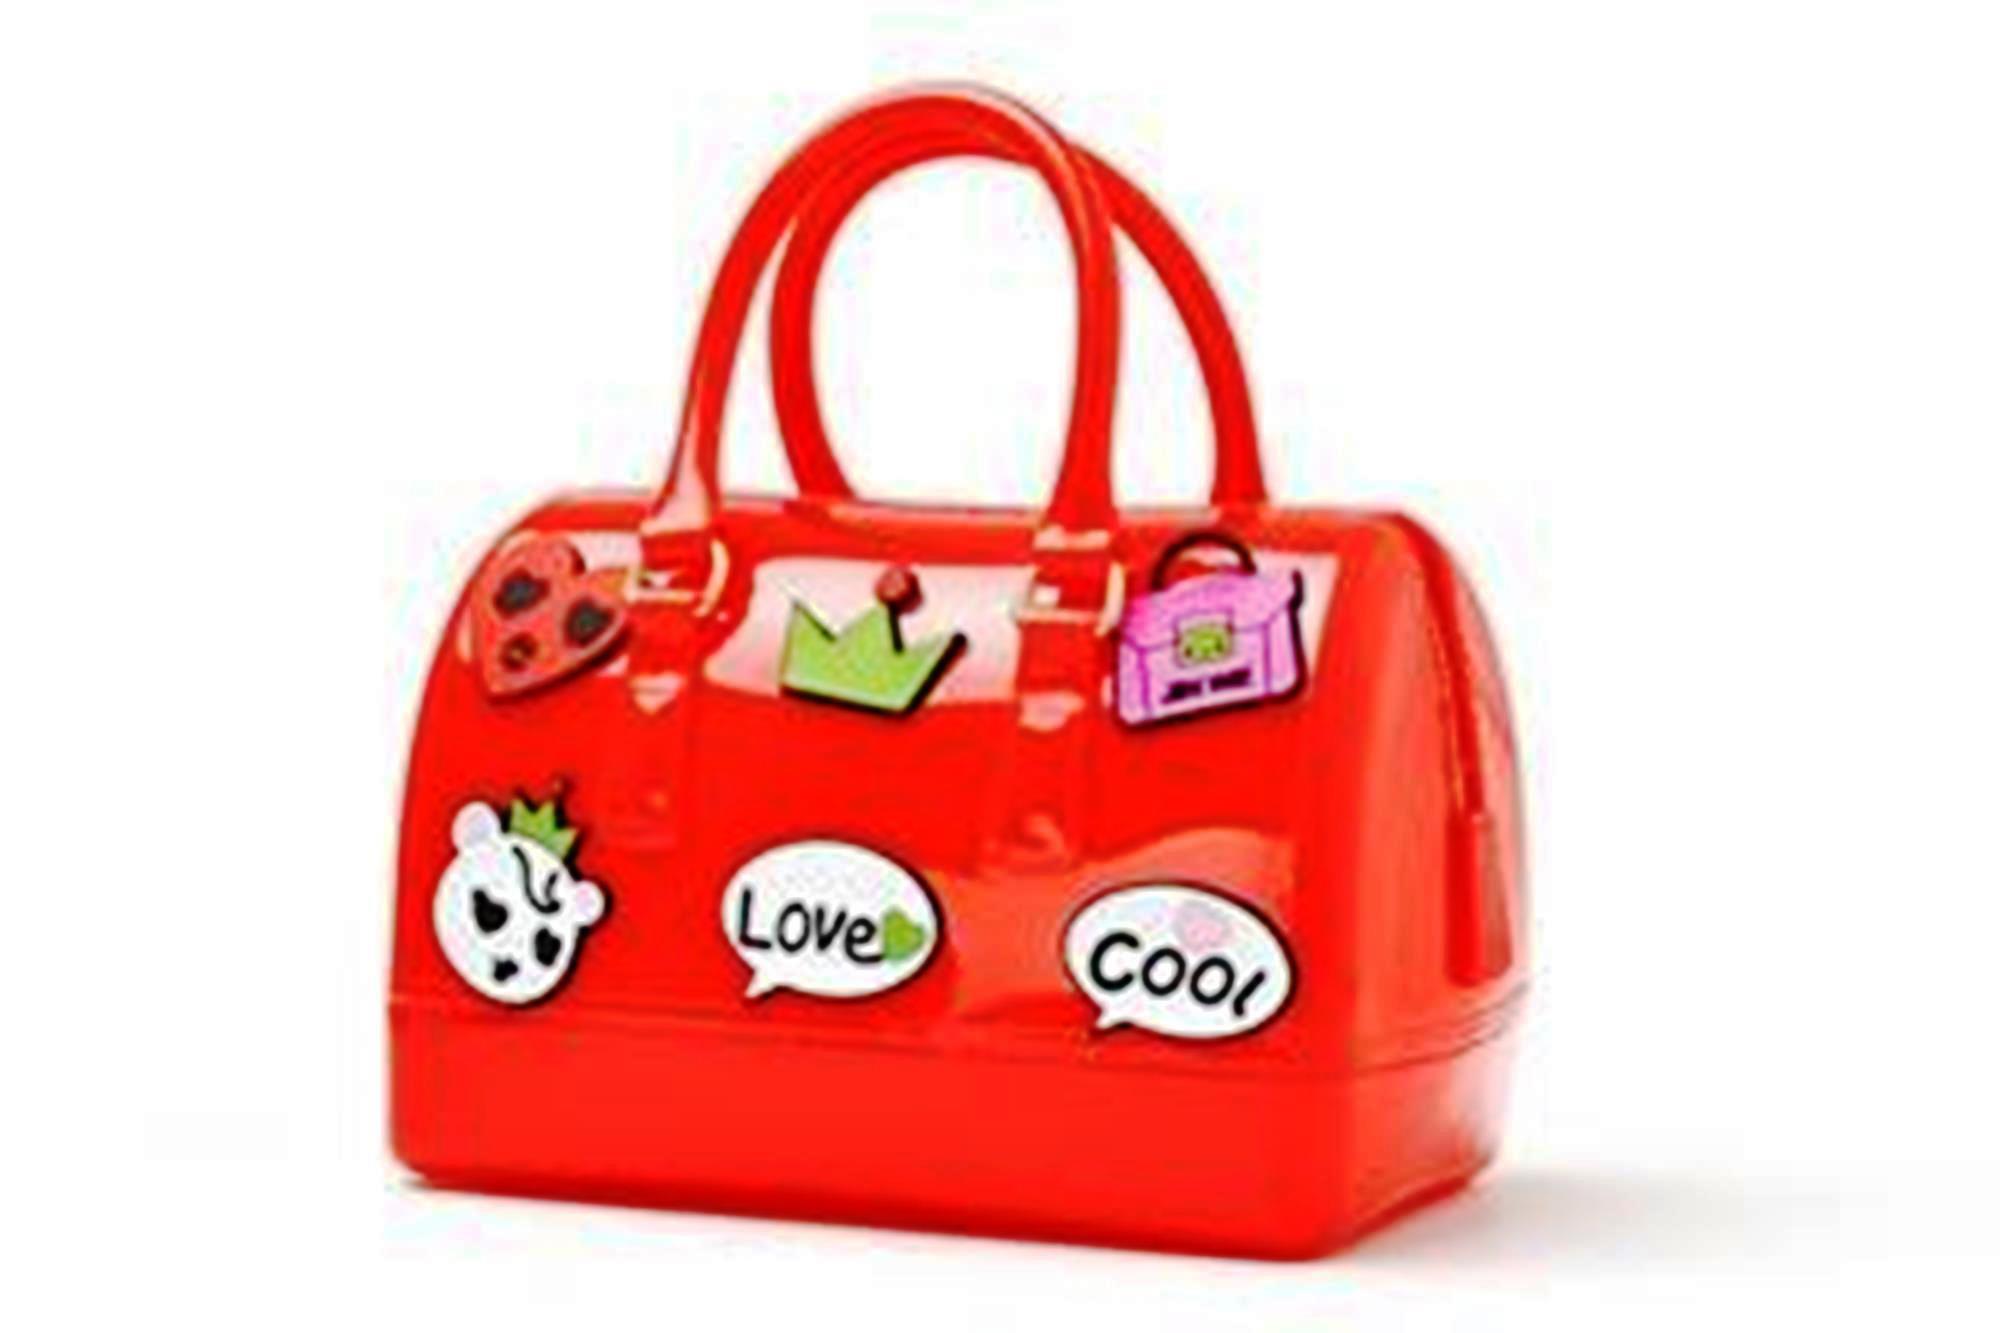 Tas Fashion Wanita Import, Tas Wanita, Tas Import Grandy's Jelly Furla Patch Sticker